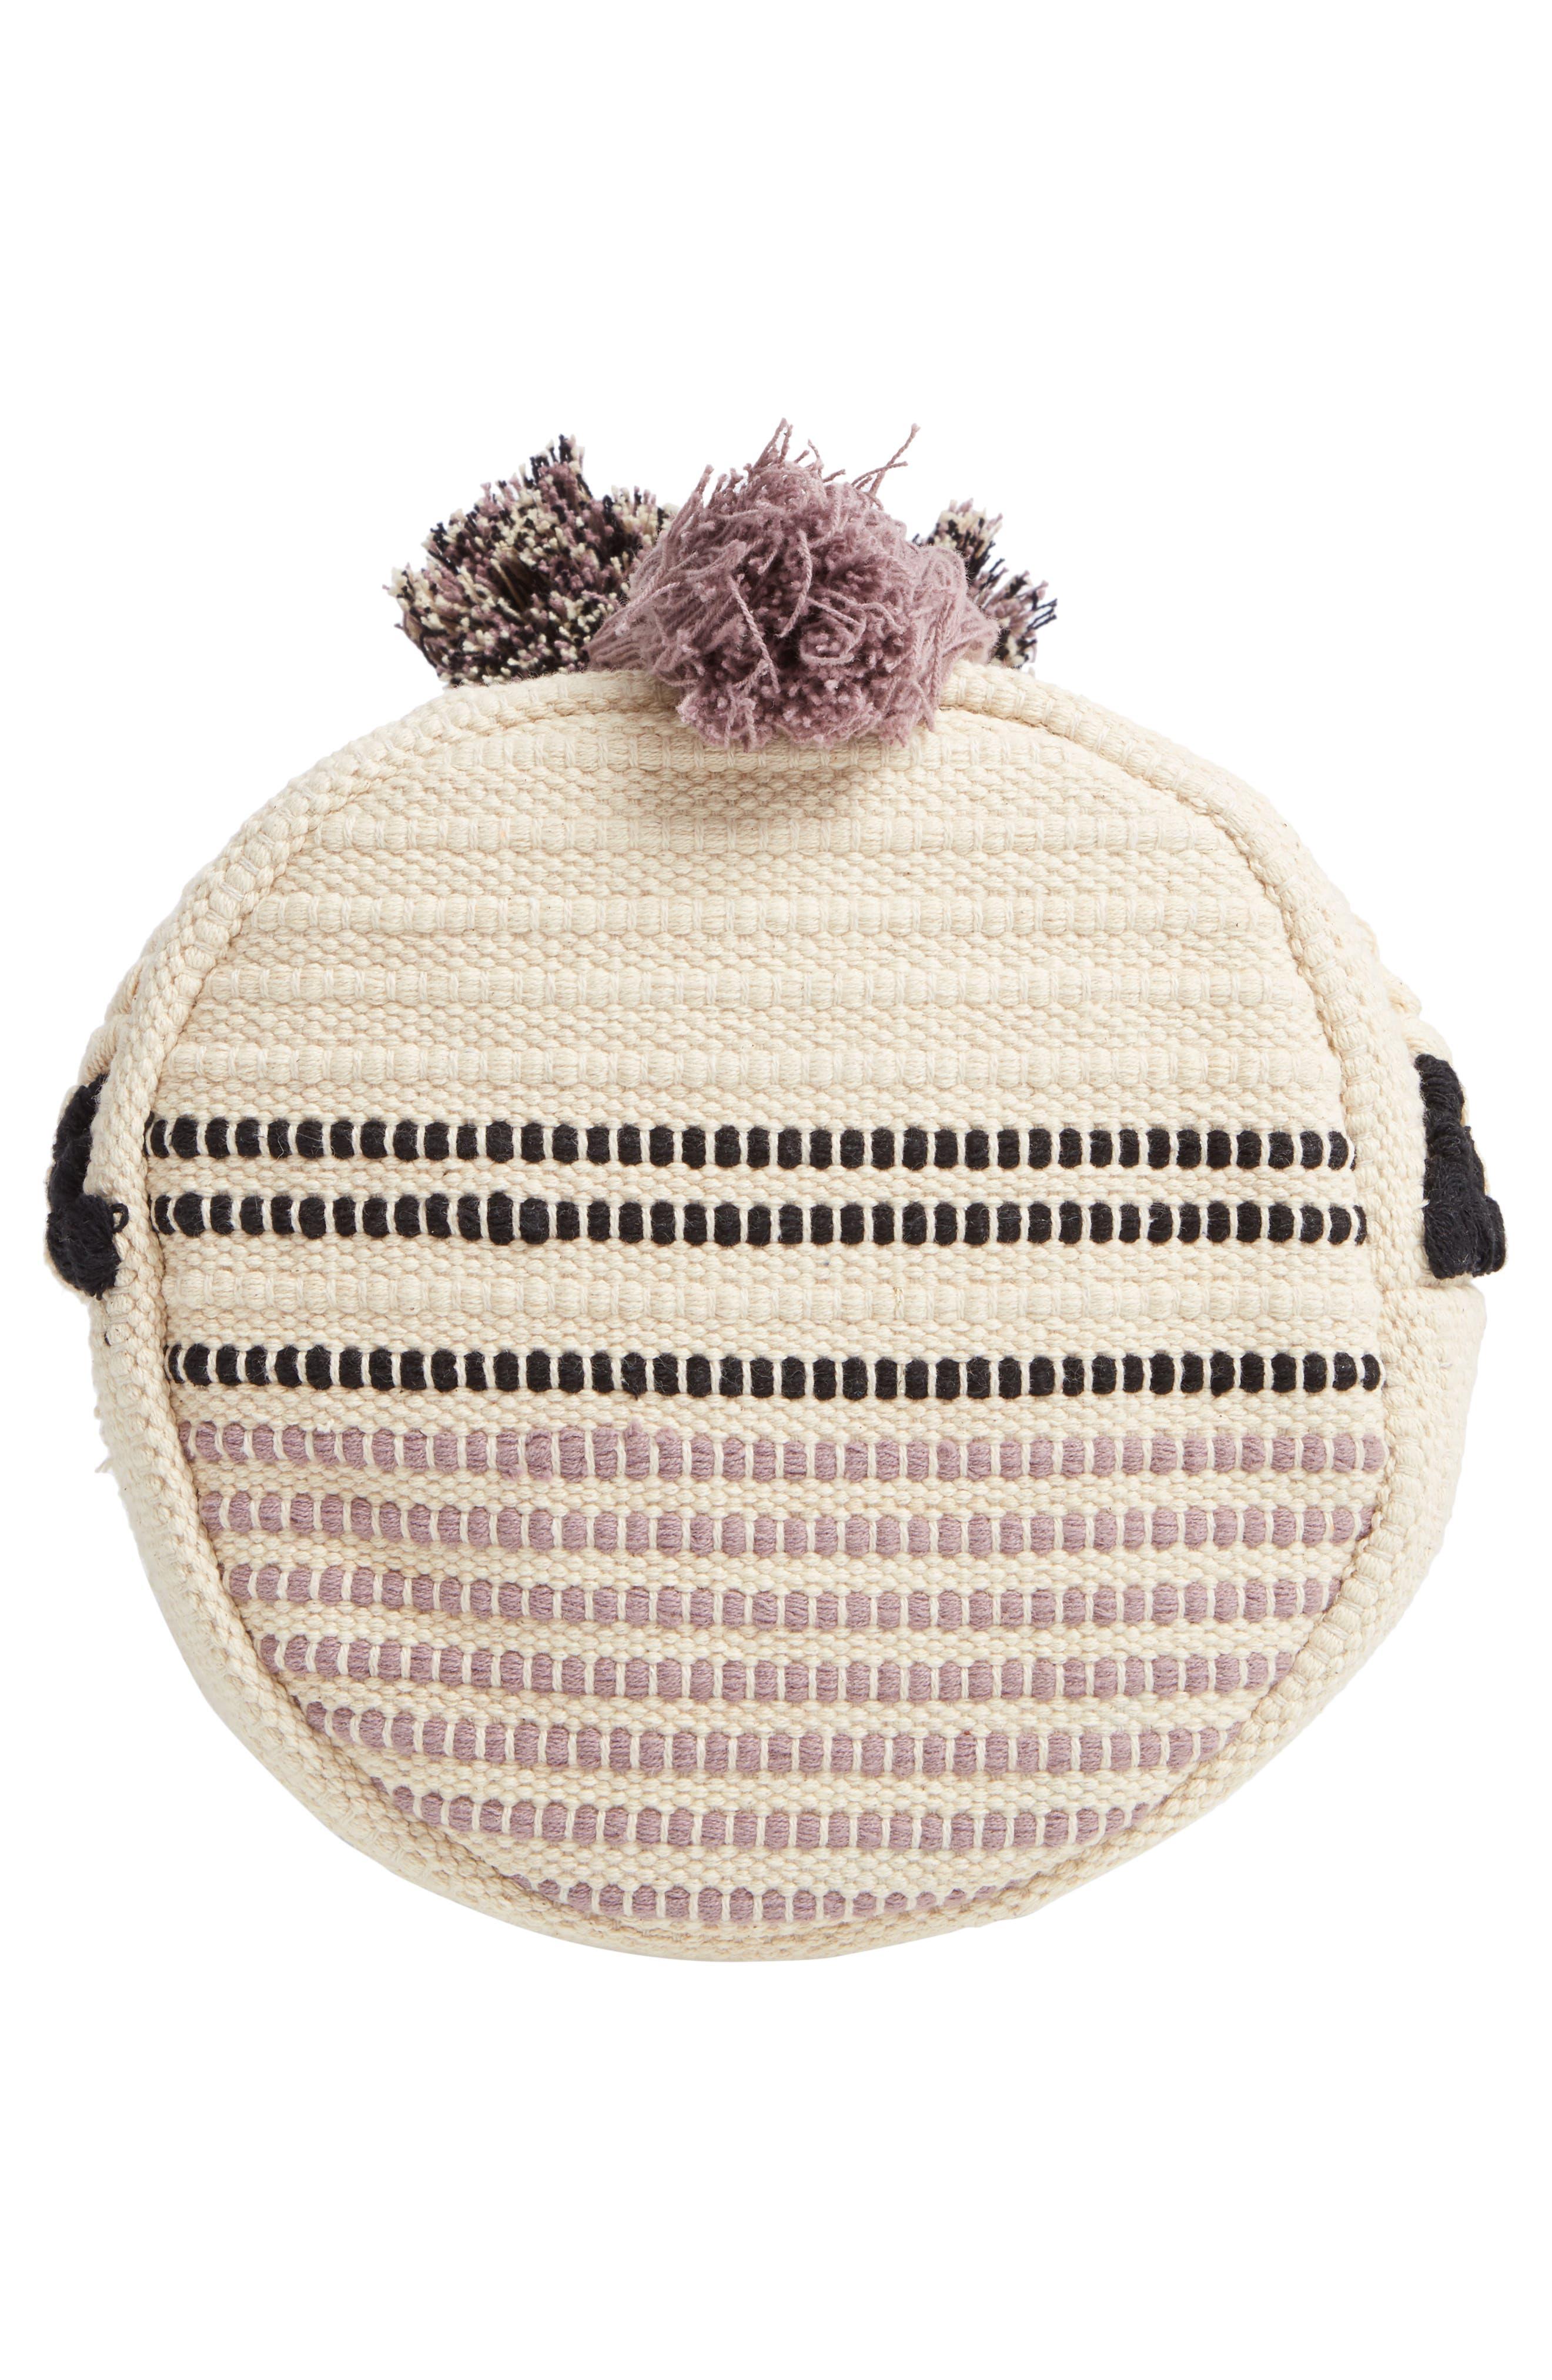 SOLE SOCIETY, Halay Woven Bucket Bag, Alternate thumbnail 7, color, 001